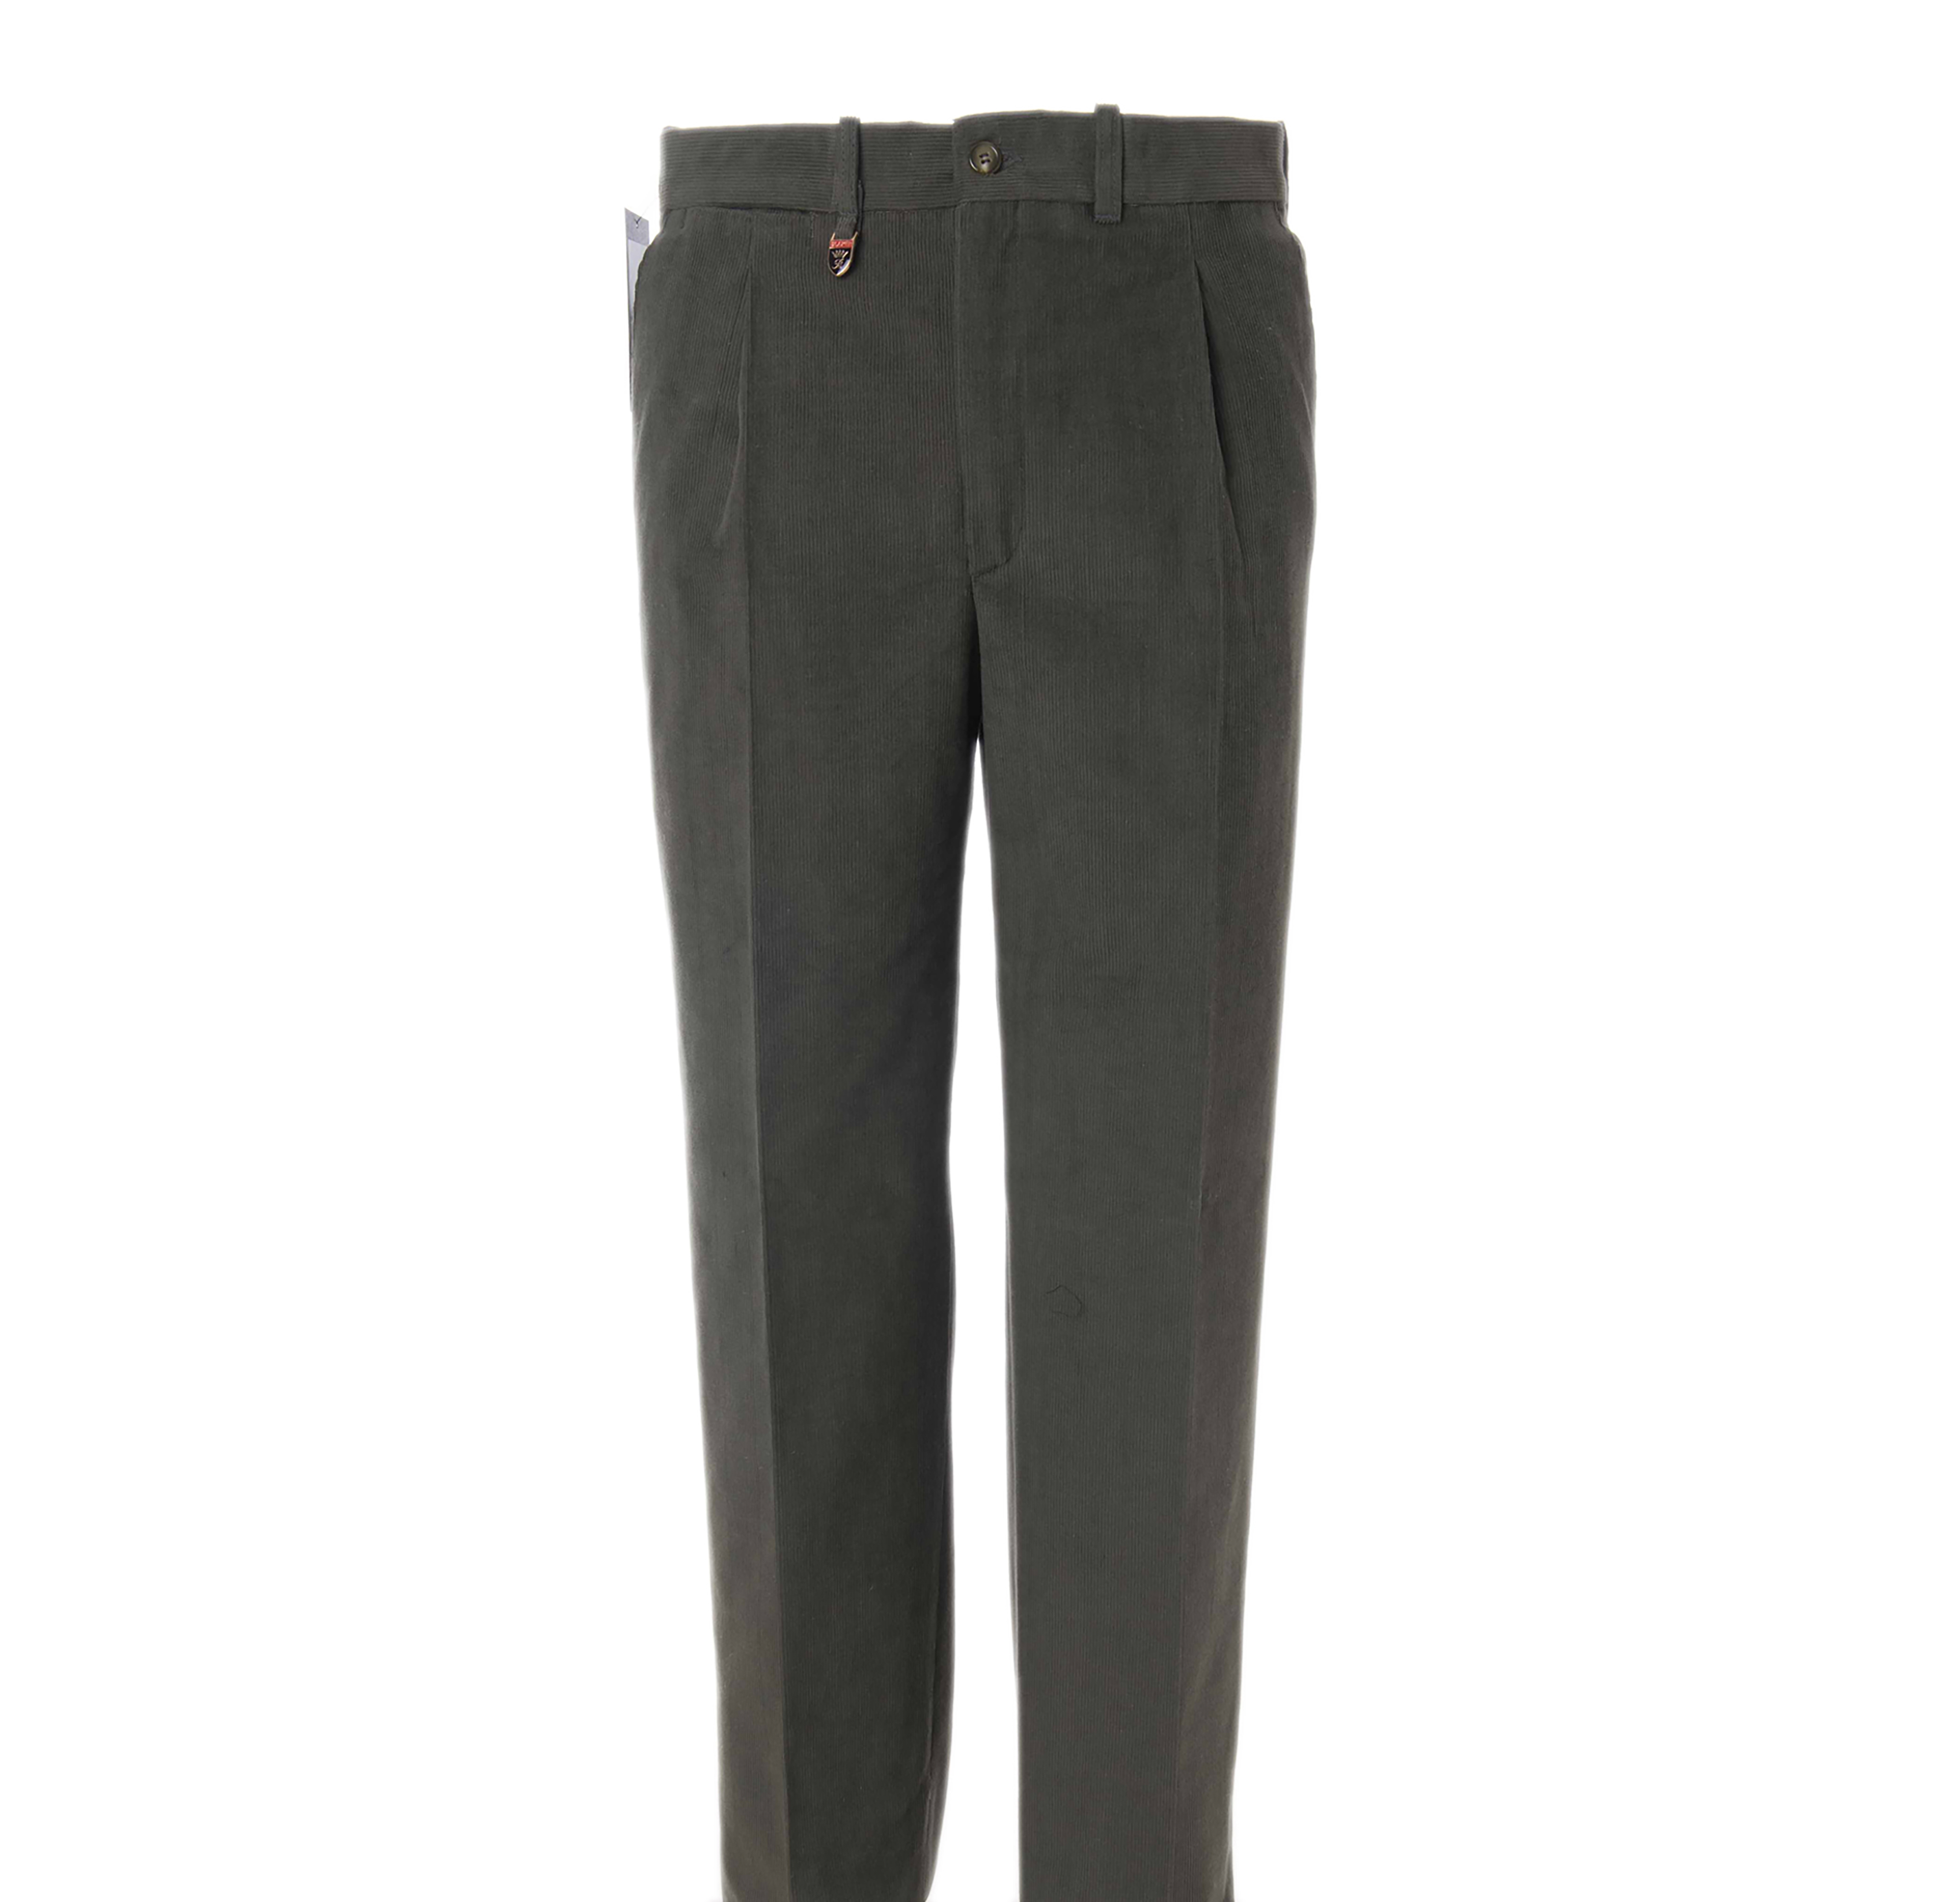 1520edab42 Pantalón de pana fina 1 Pinza para hombre - Pantalones Blaper